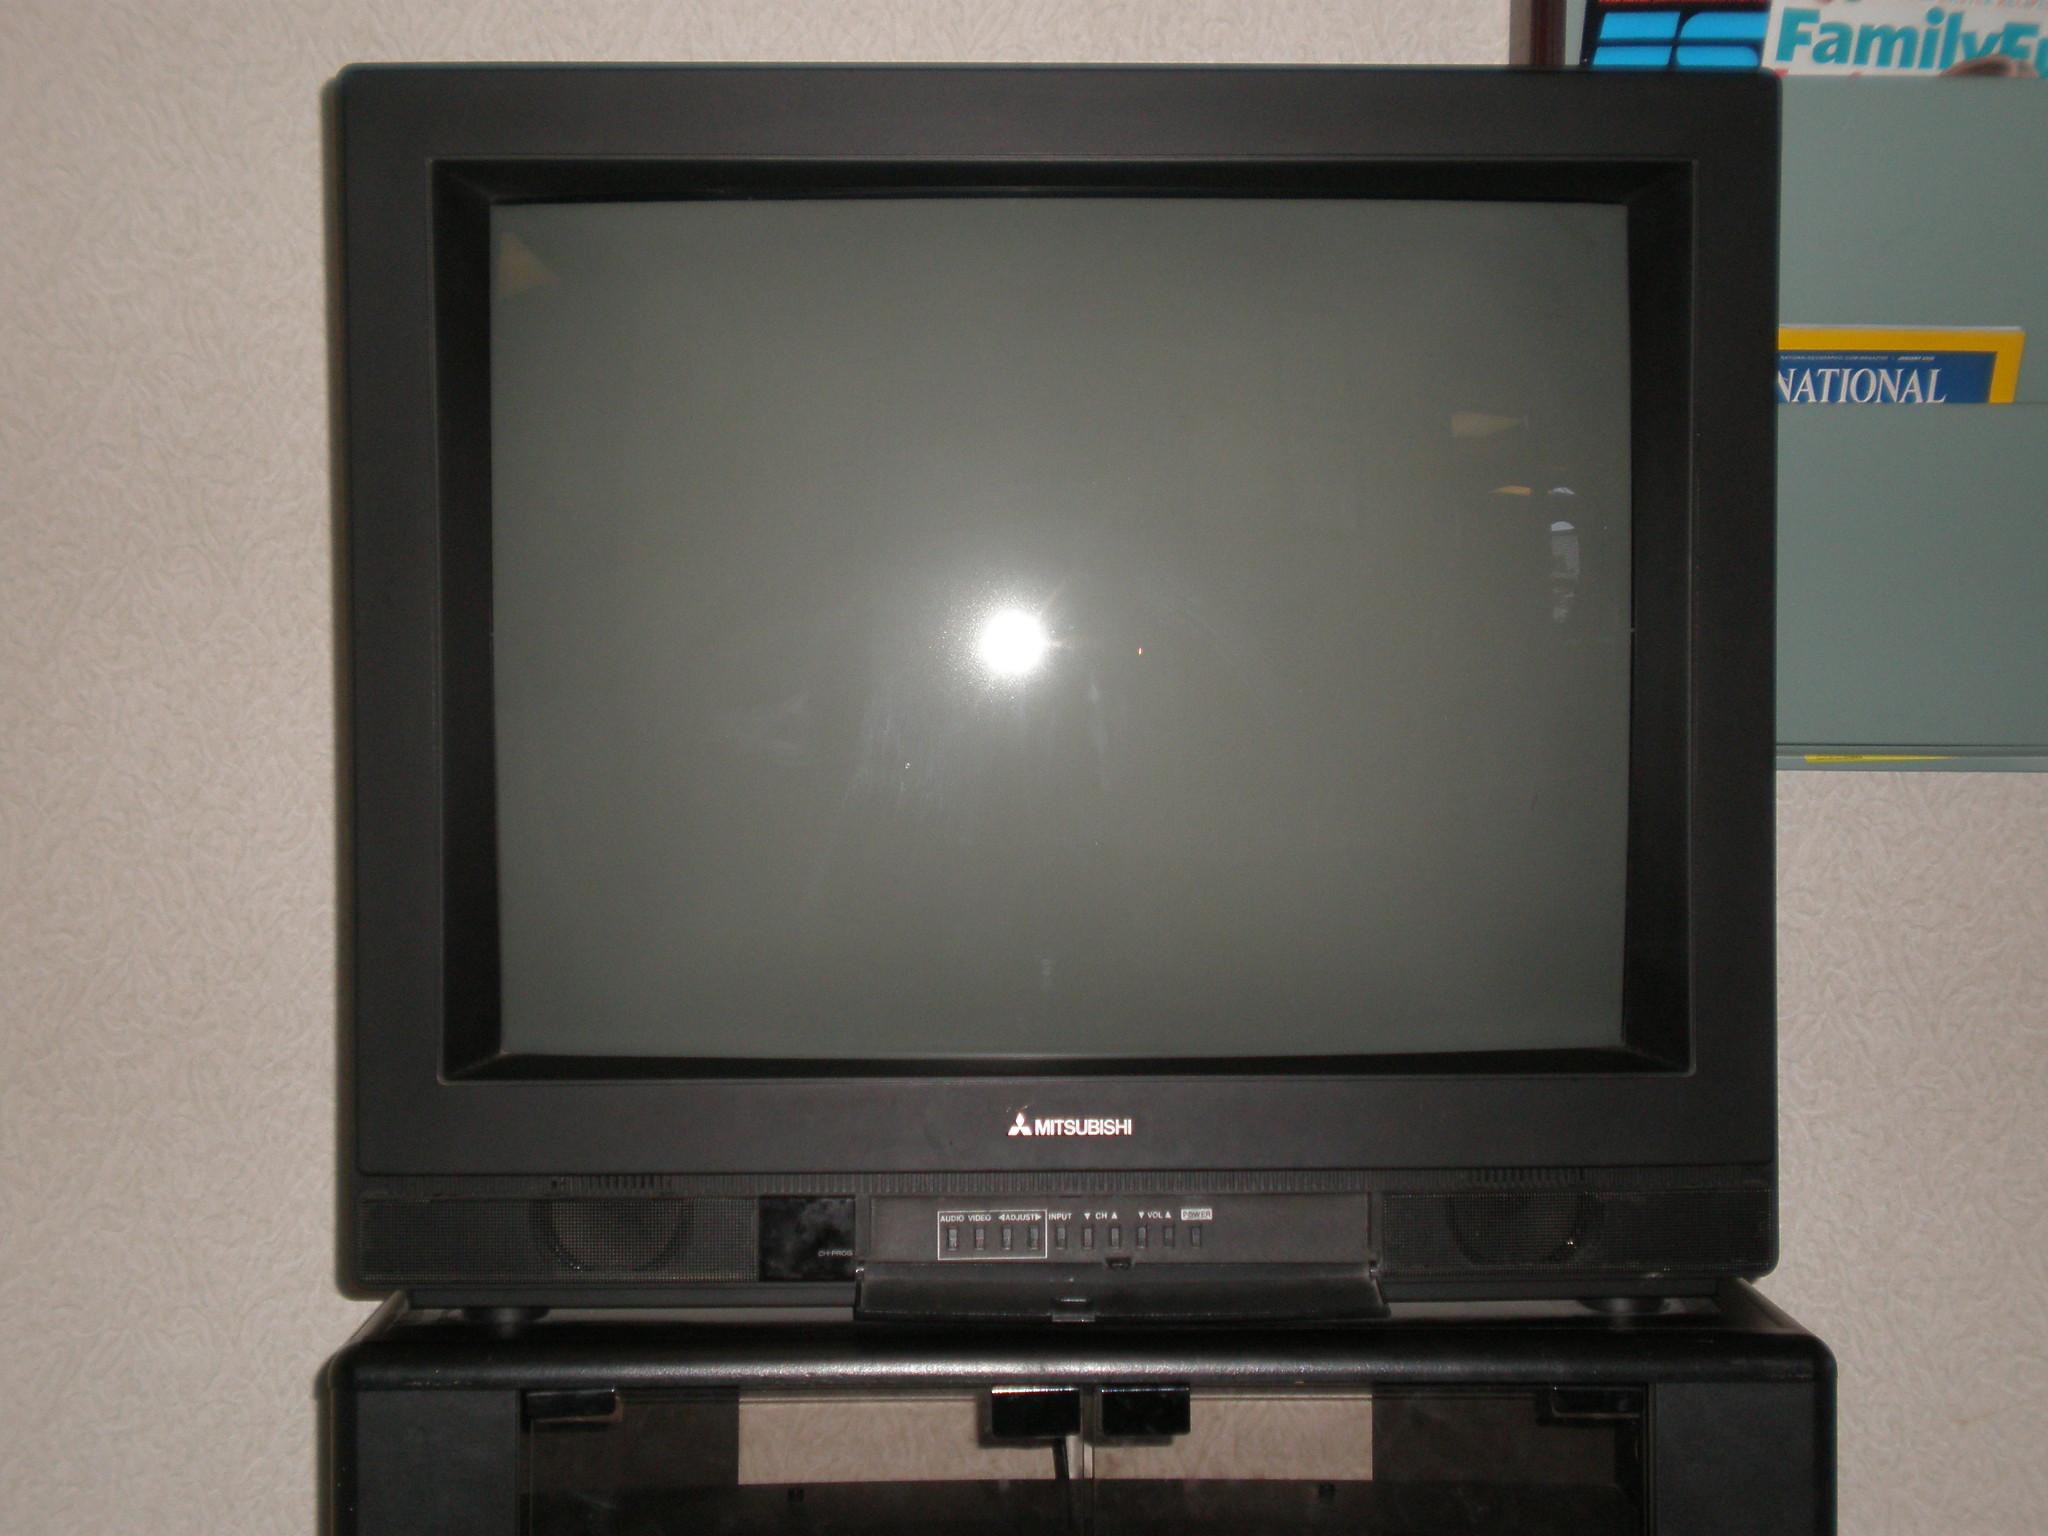 Шарп телевизоры старые модели настройка